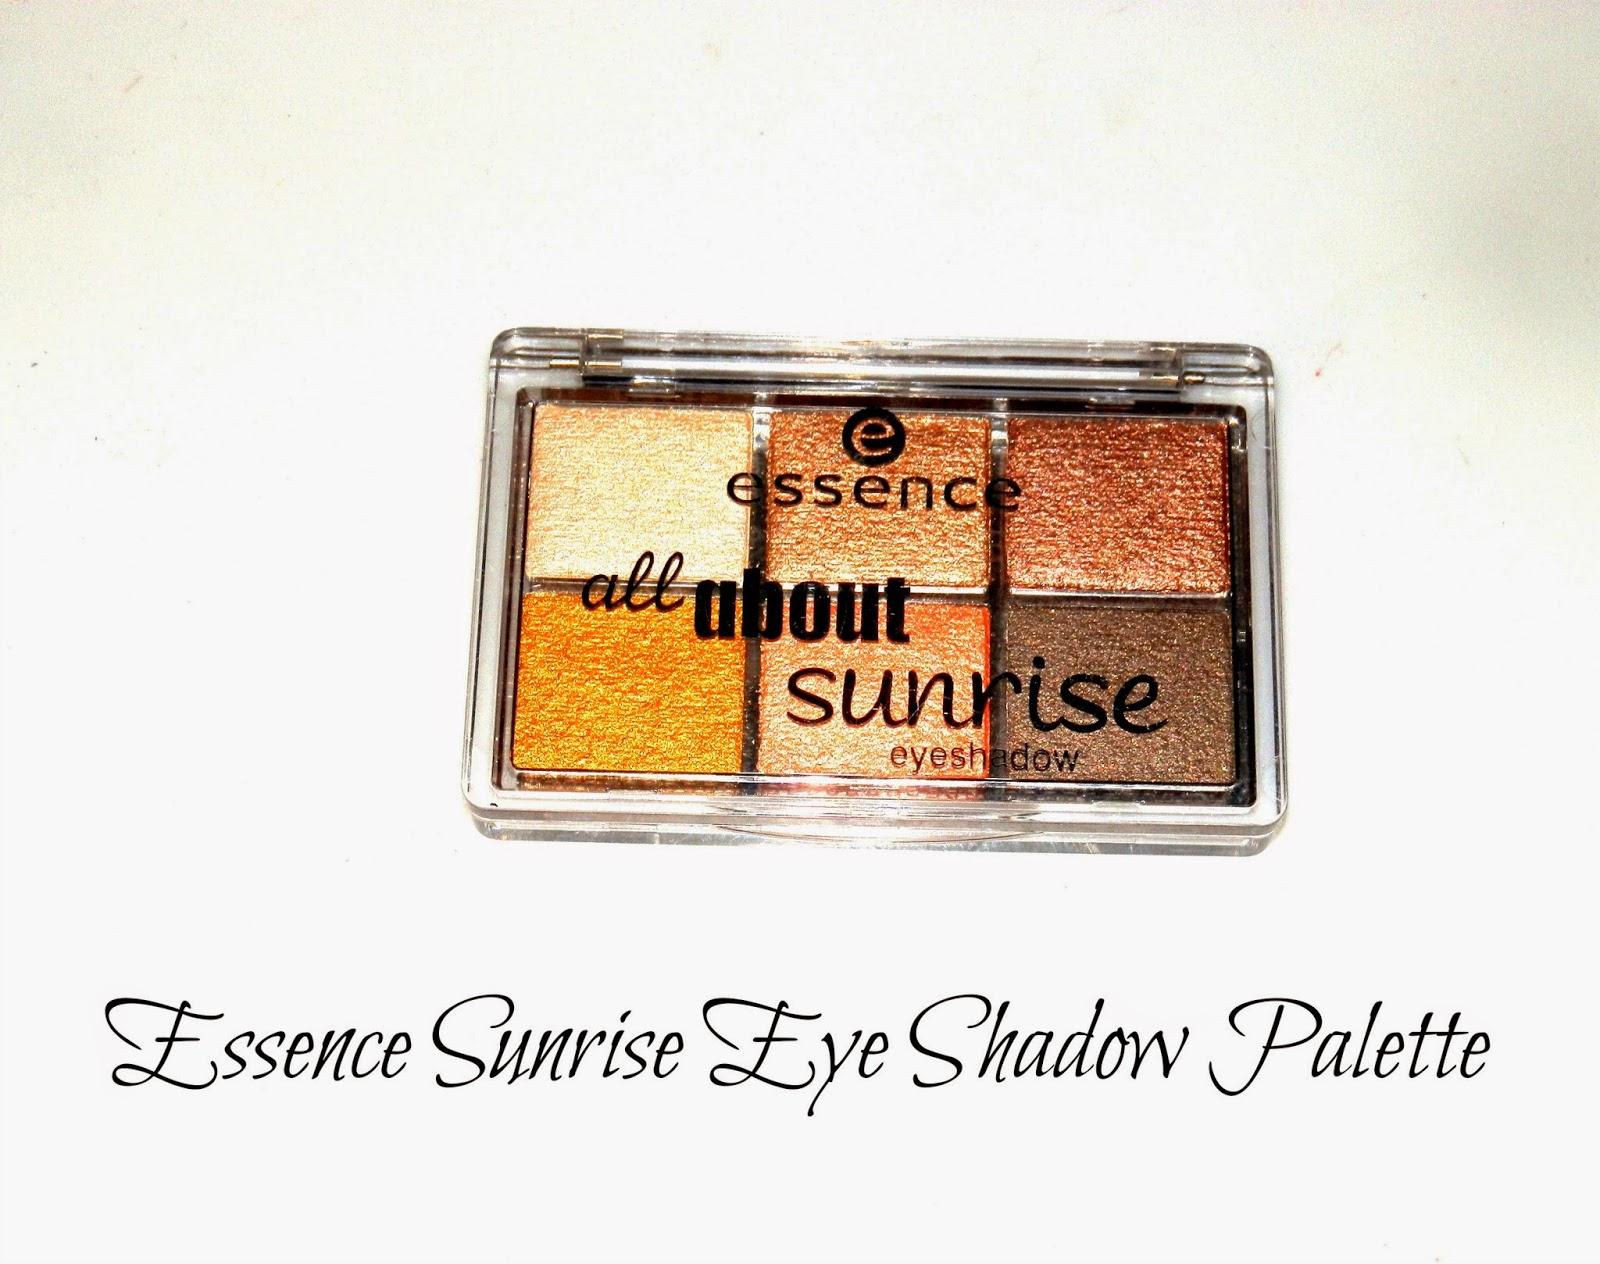 Essence Sunrise Eye Shadow Palette Swatches